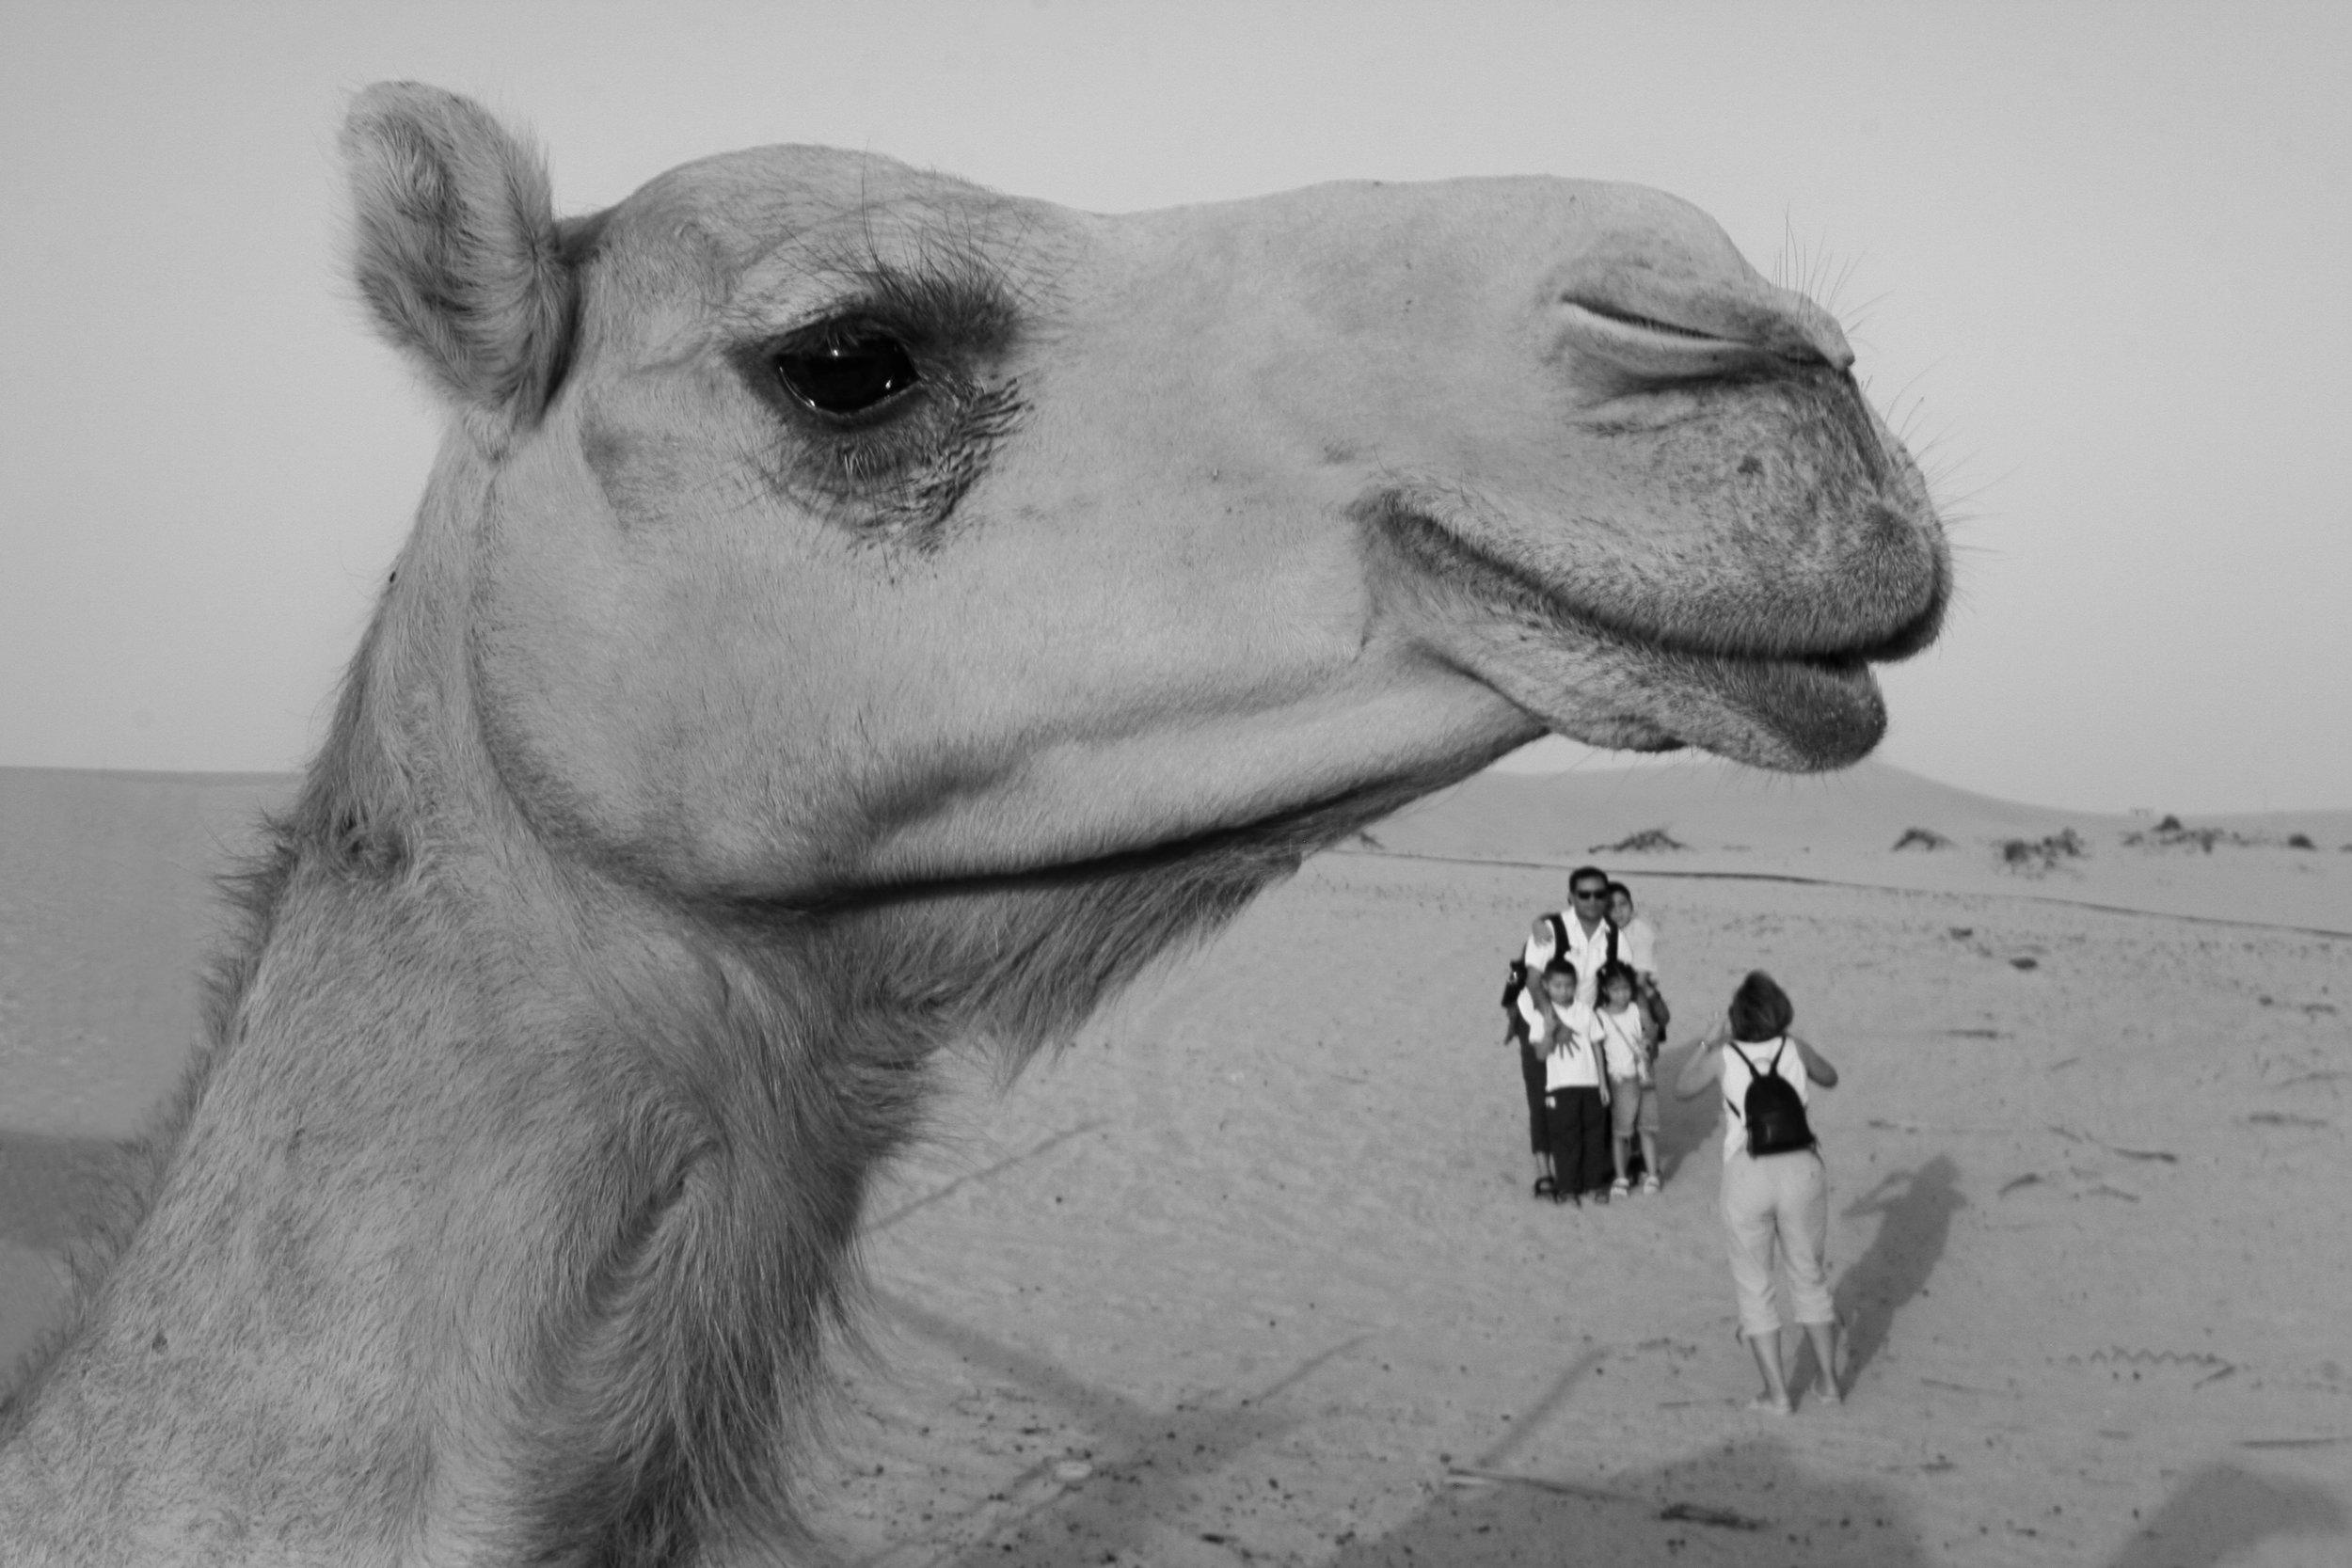 uae_camel.jpg